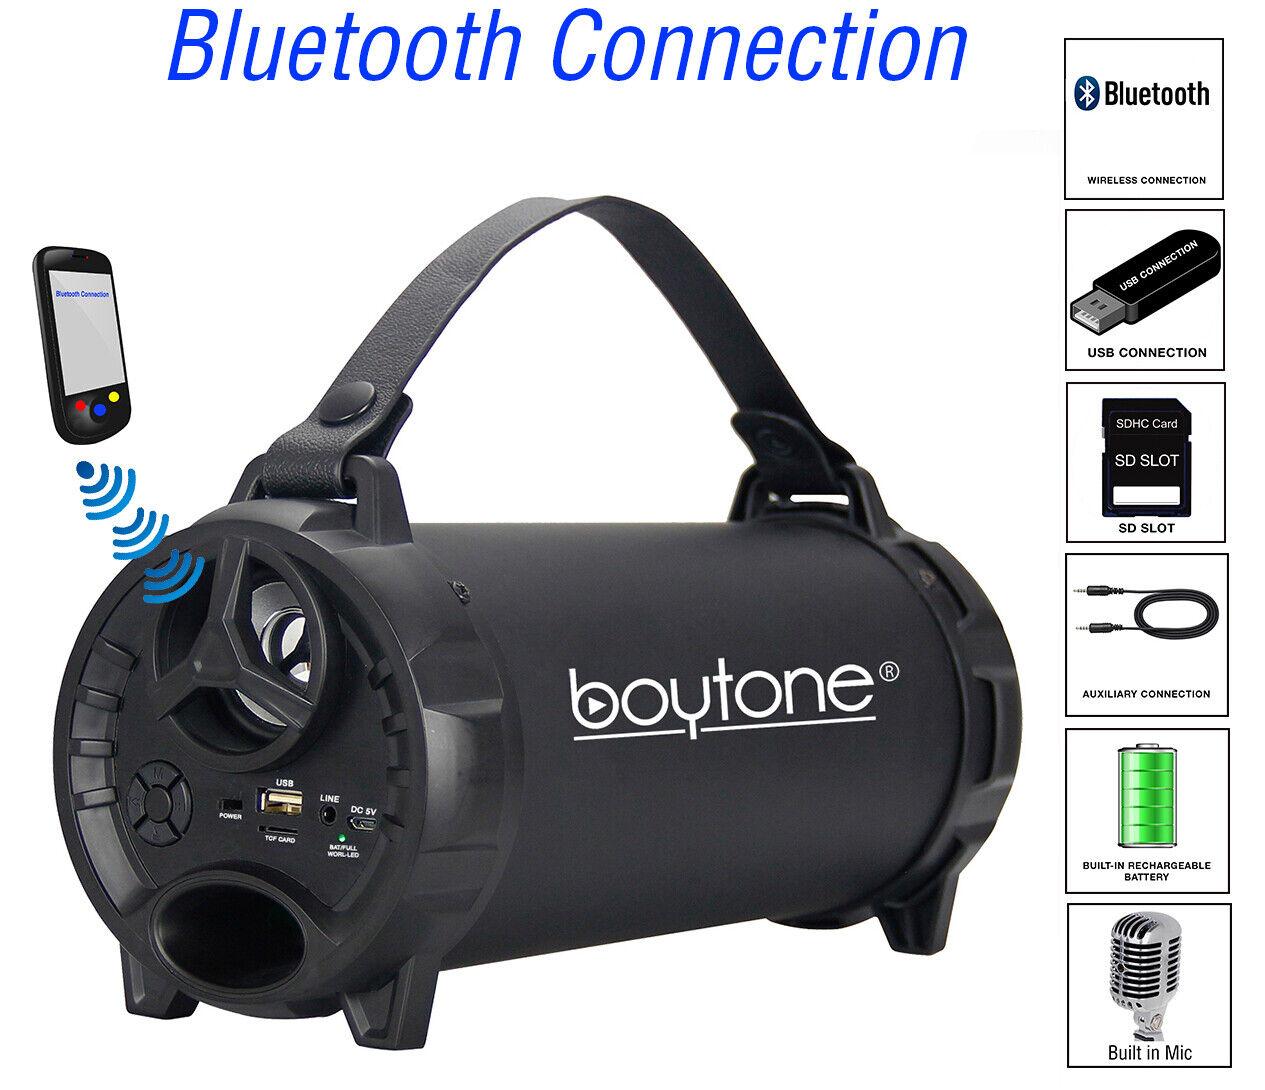 Boytone BT-40BK Portable Bluetooth Indoor/Outdoor Speaker 2.